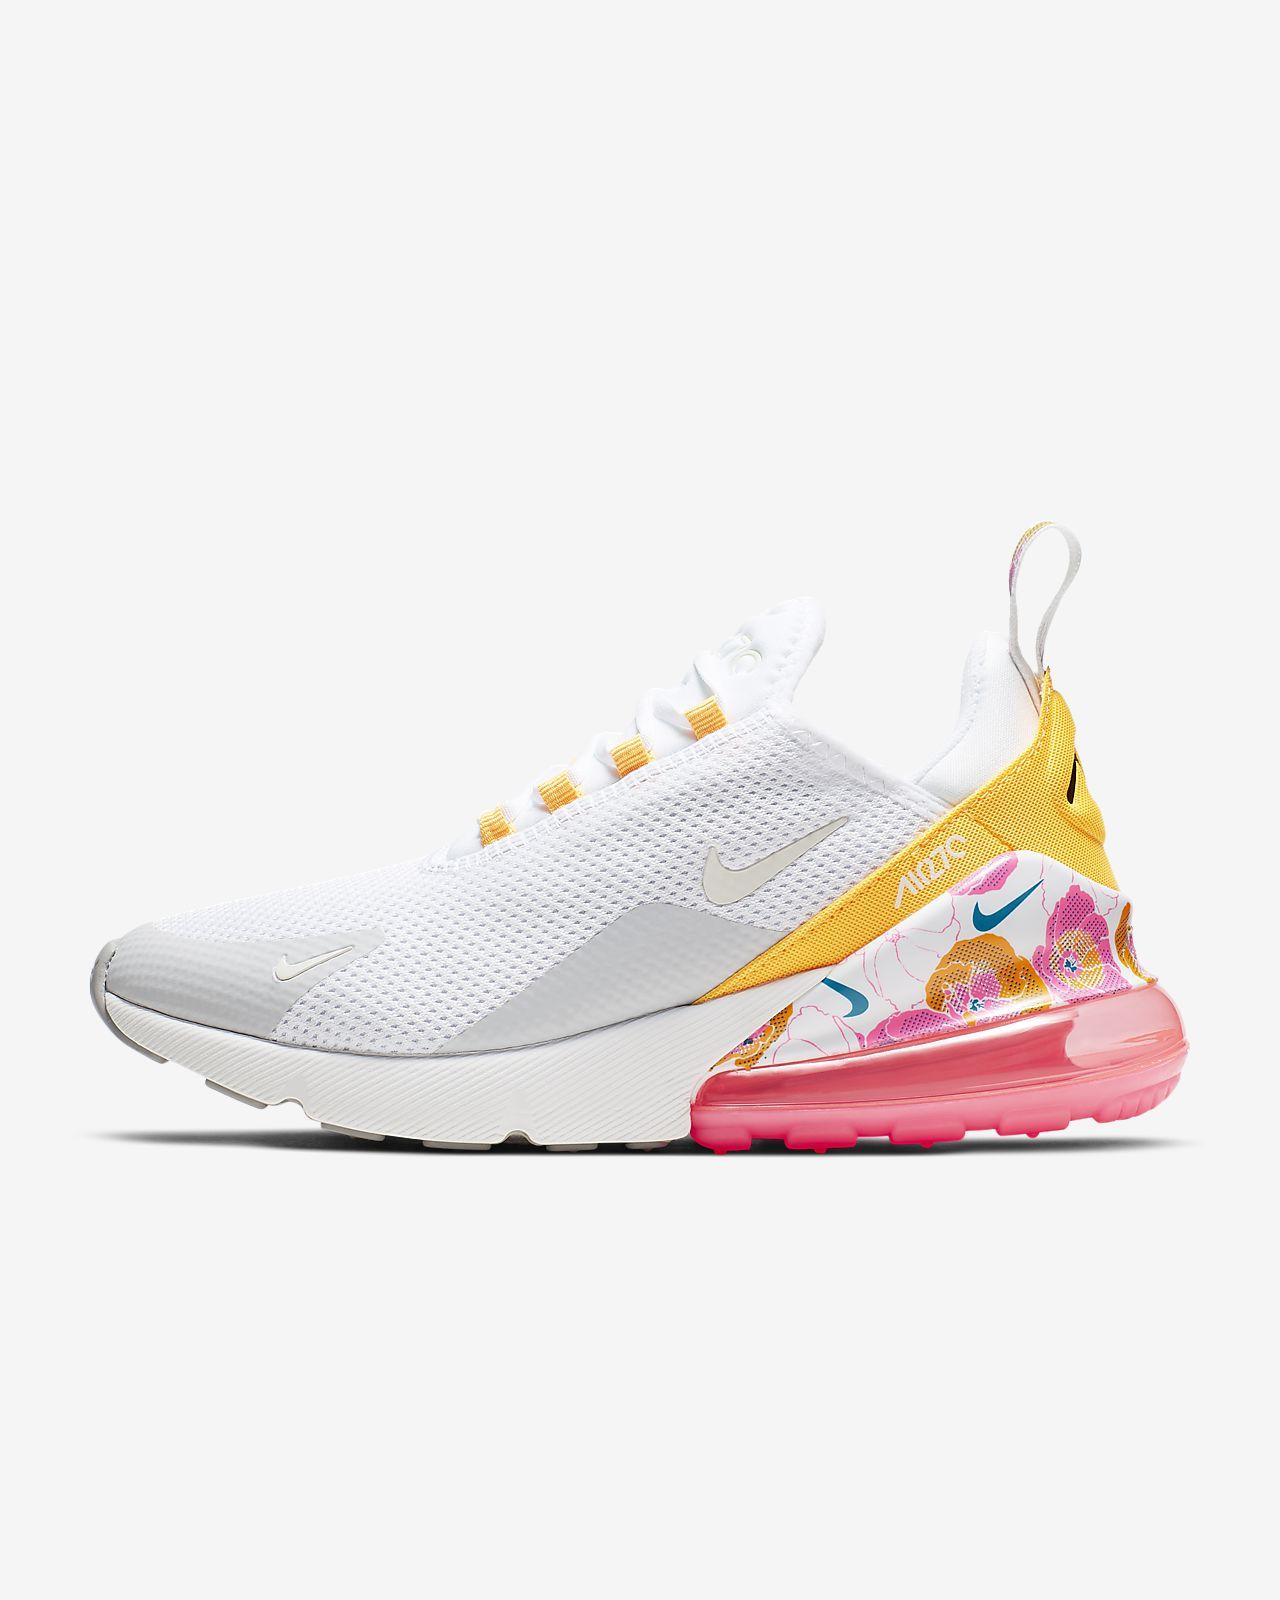 Nike Air Max 270 SE Floral Women's Shoe